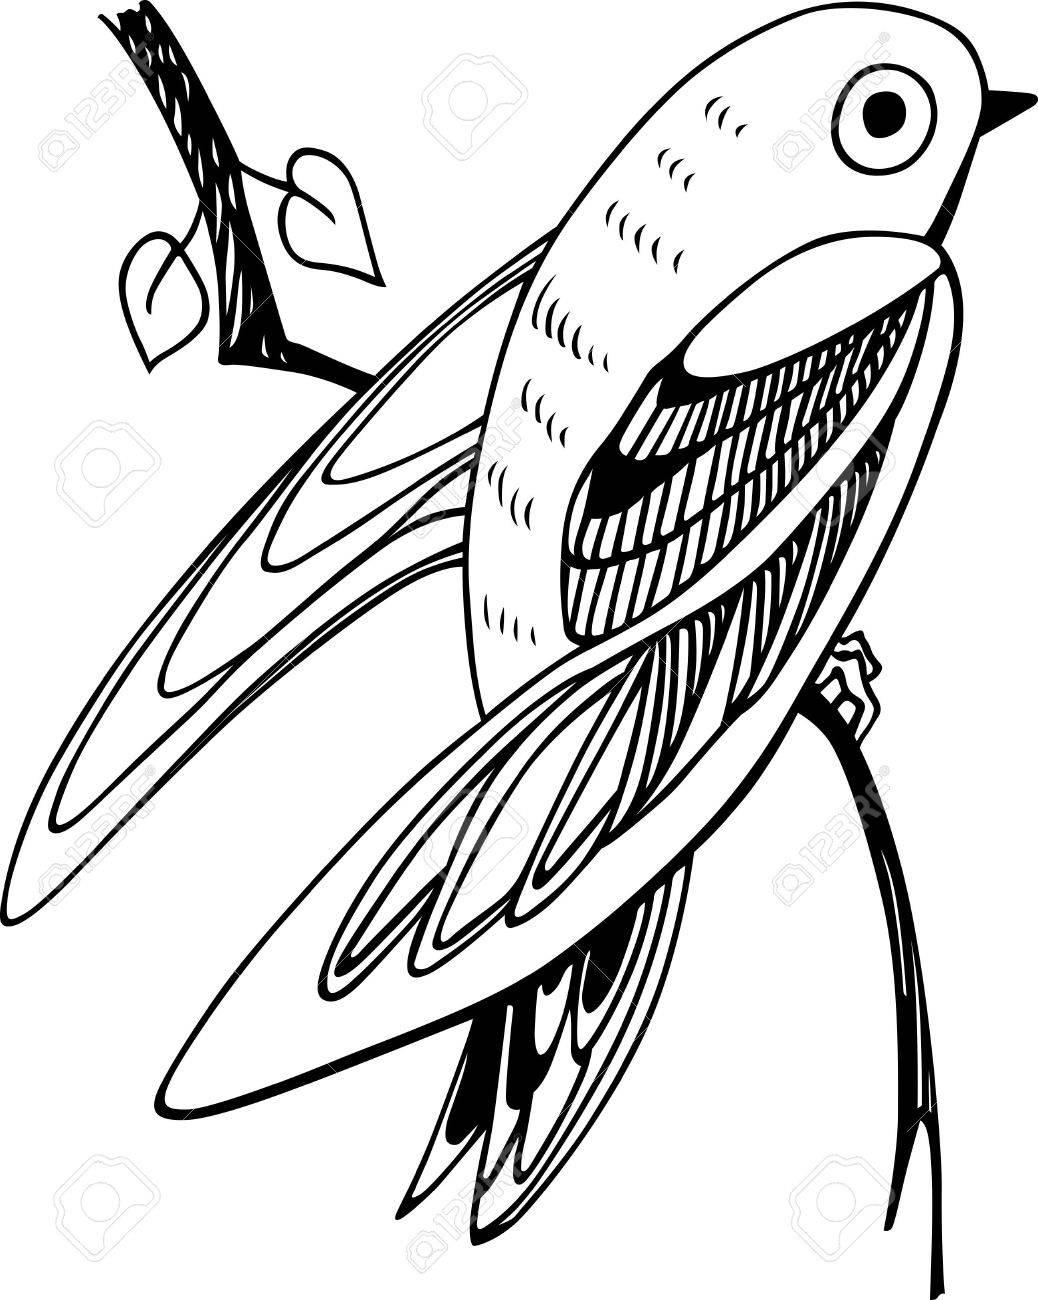 Small bird on the branch Stock Vector - 13450305